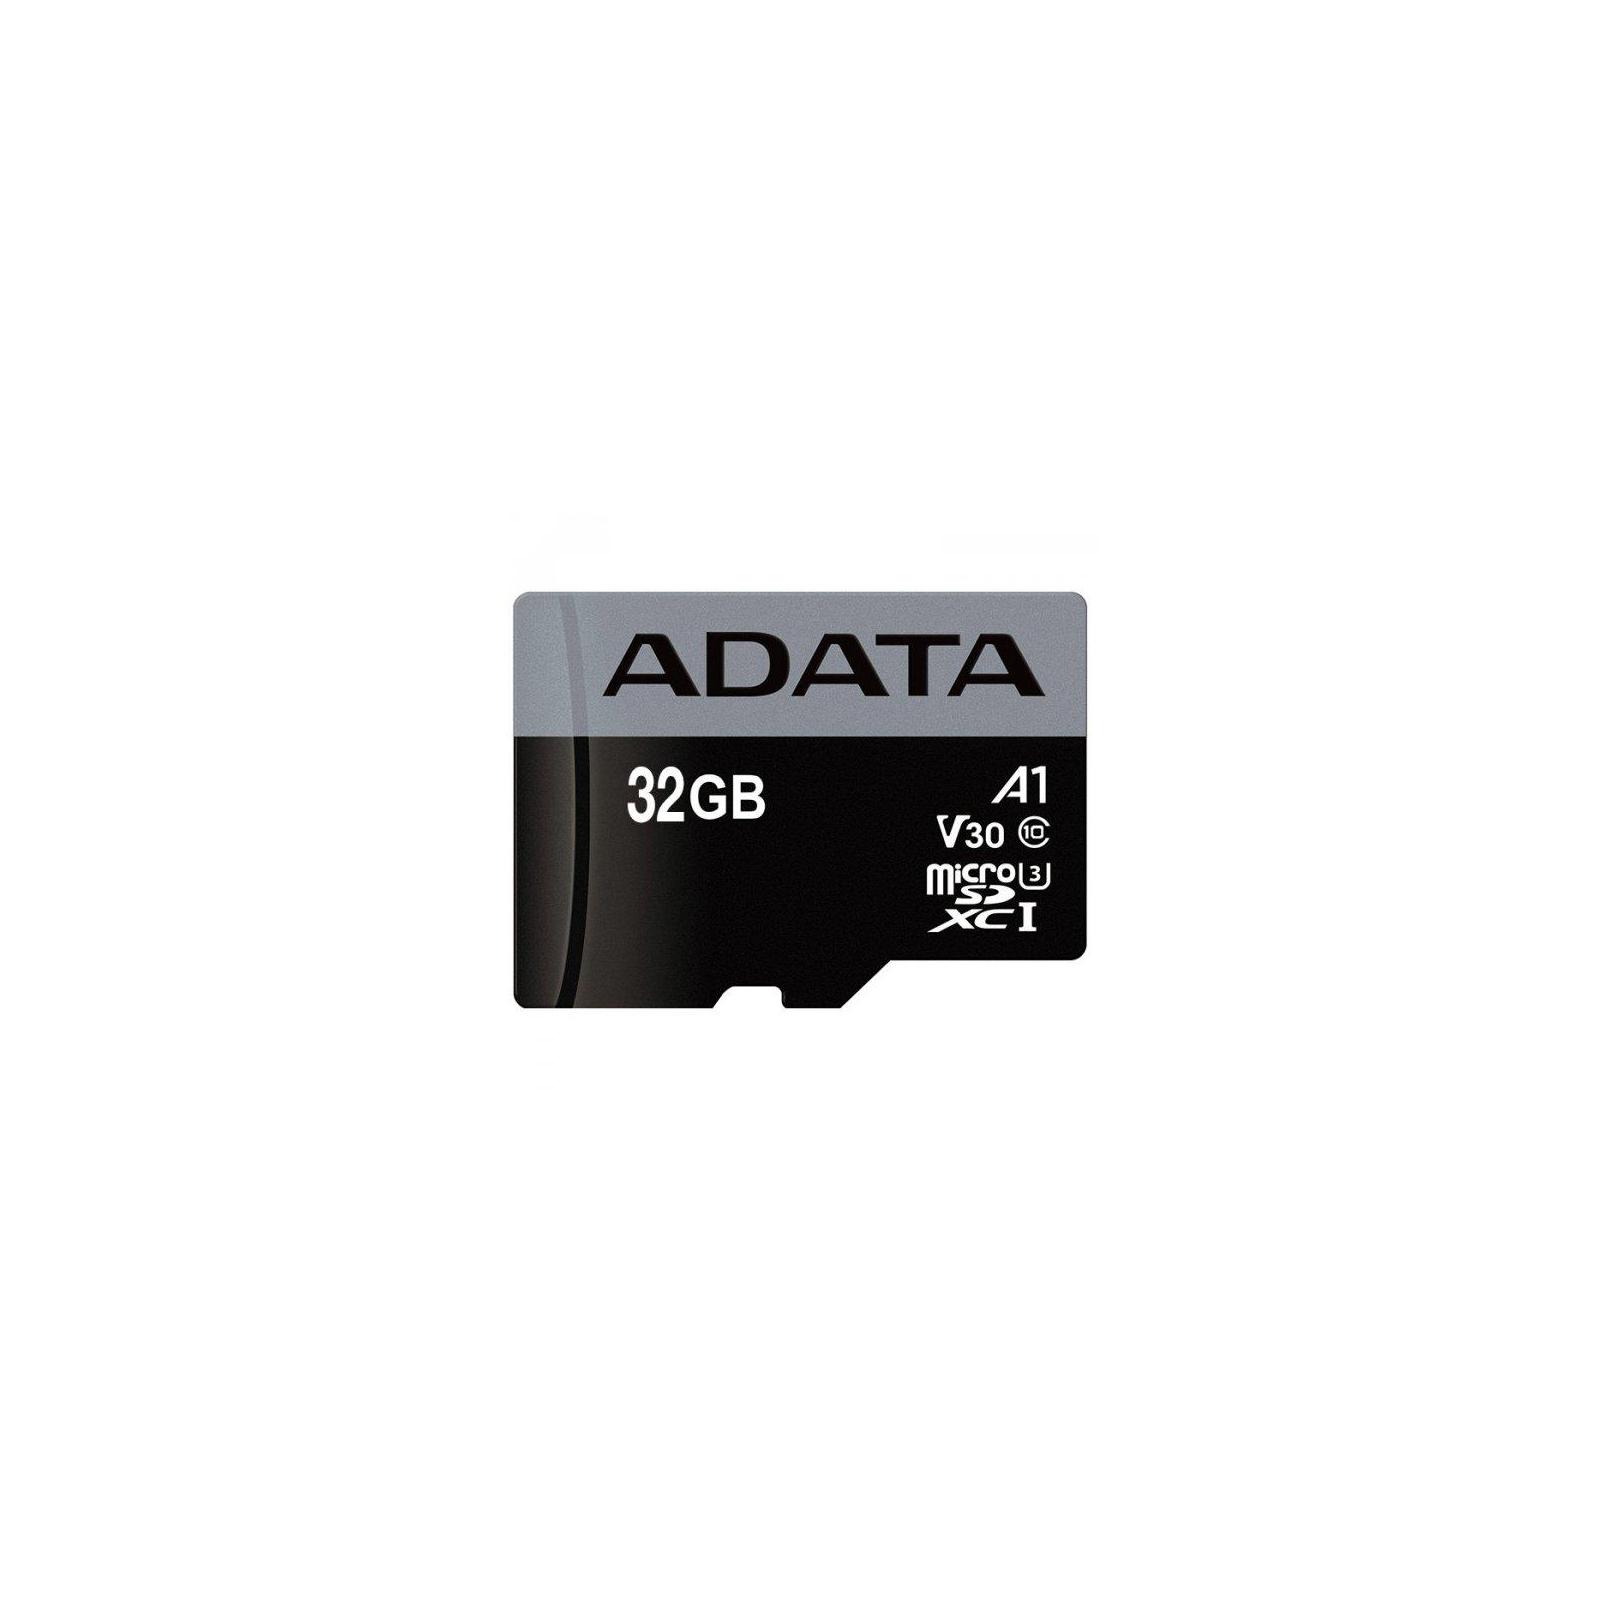 Карта памяти ADATA 32GB microSD class 10 UHS-I U3 A1 (AUSDH32GUI3V30SA1-RA1) изображение 2